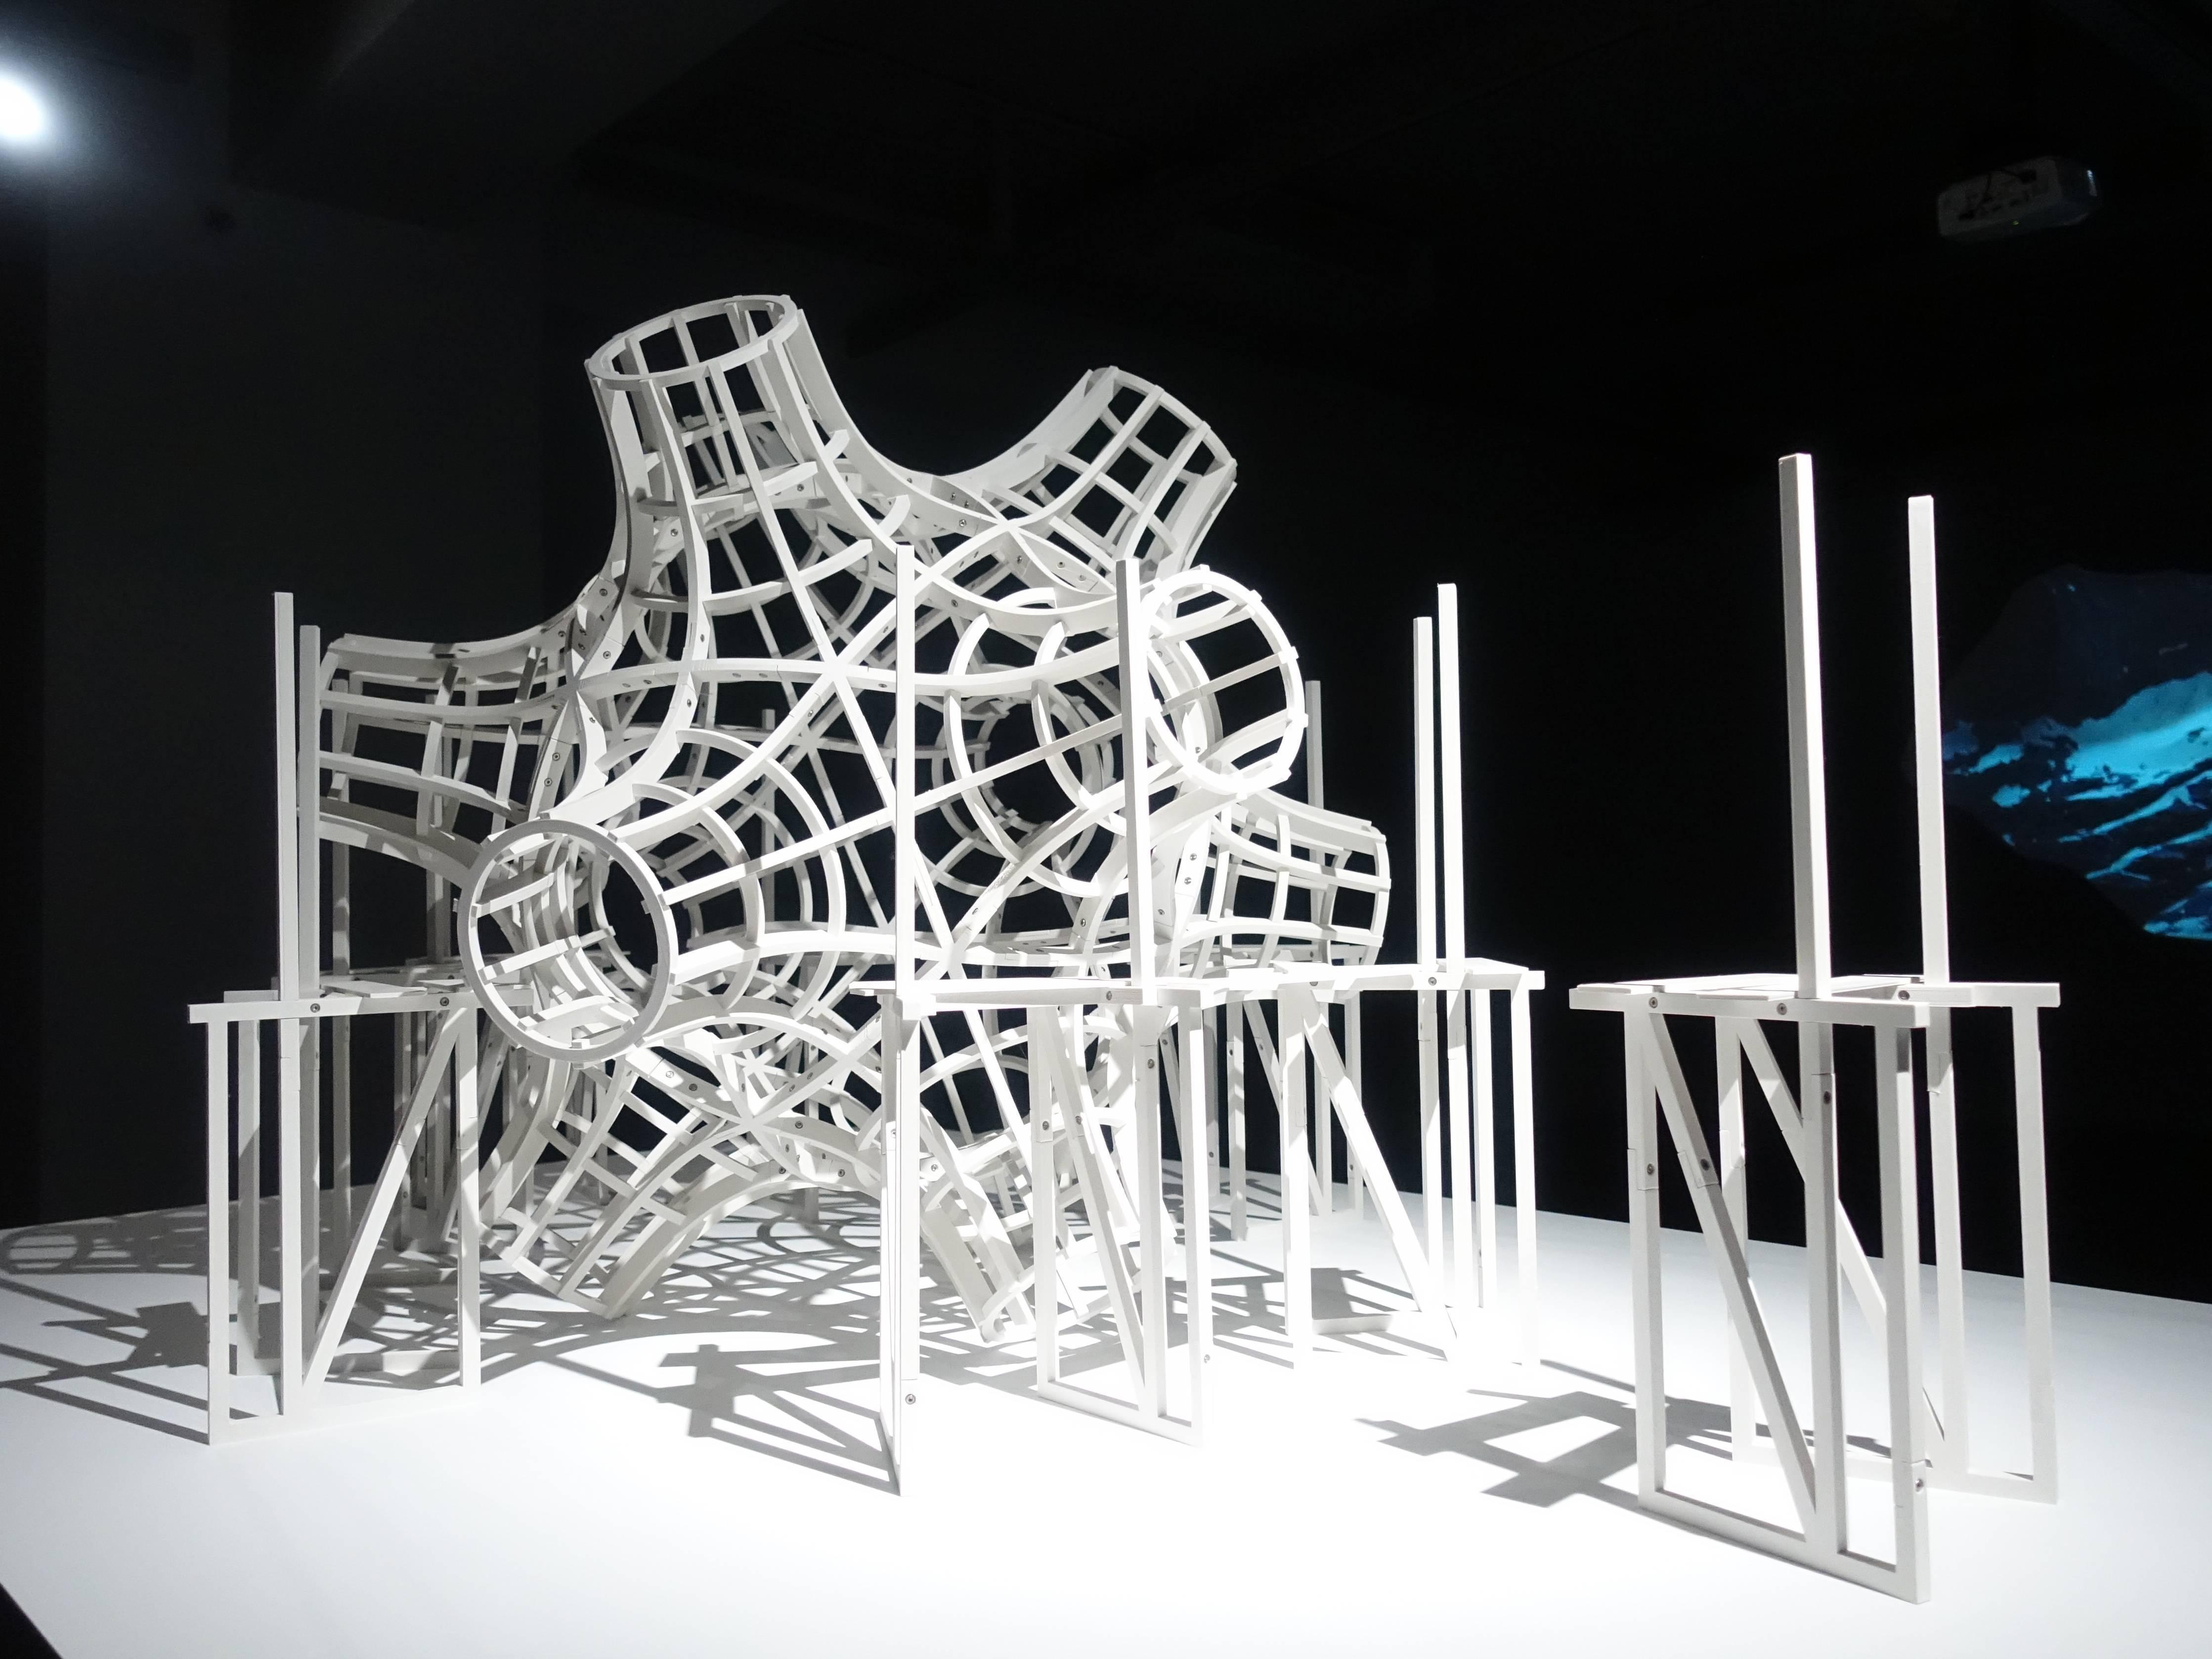 Florian Claar,《Vessel 陸上行舟 IV》,91 x 190 x 125 cm,PLA、stainless steel bolts、不鏽鋼螺栓,2019。